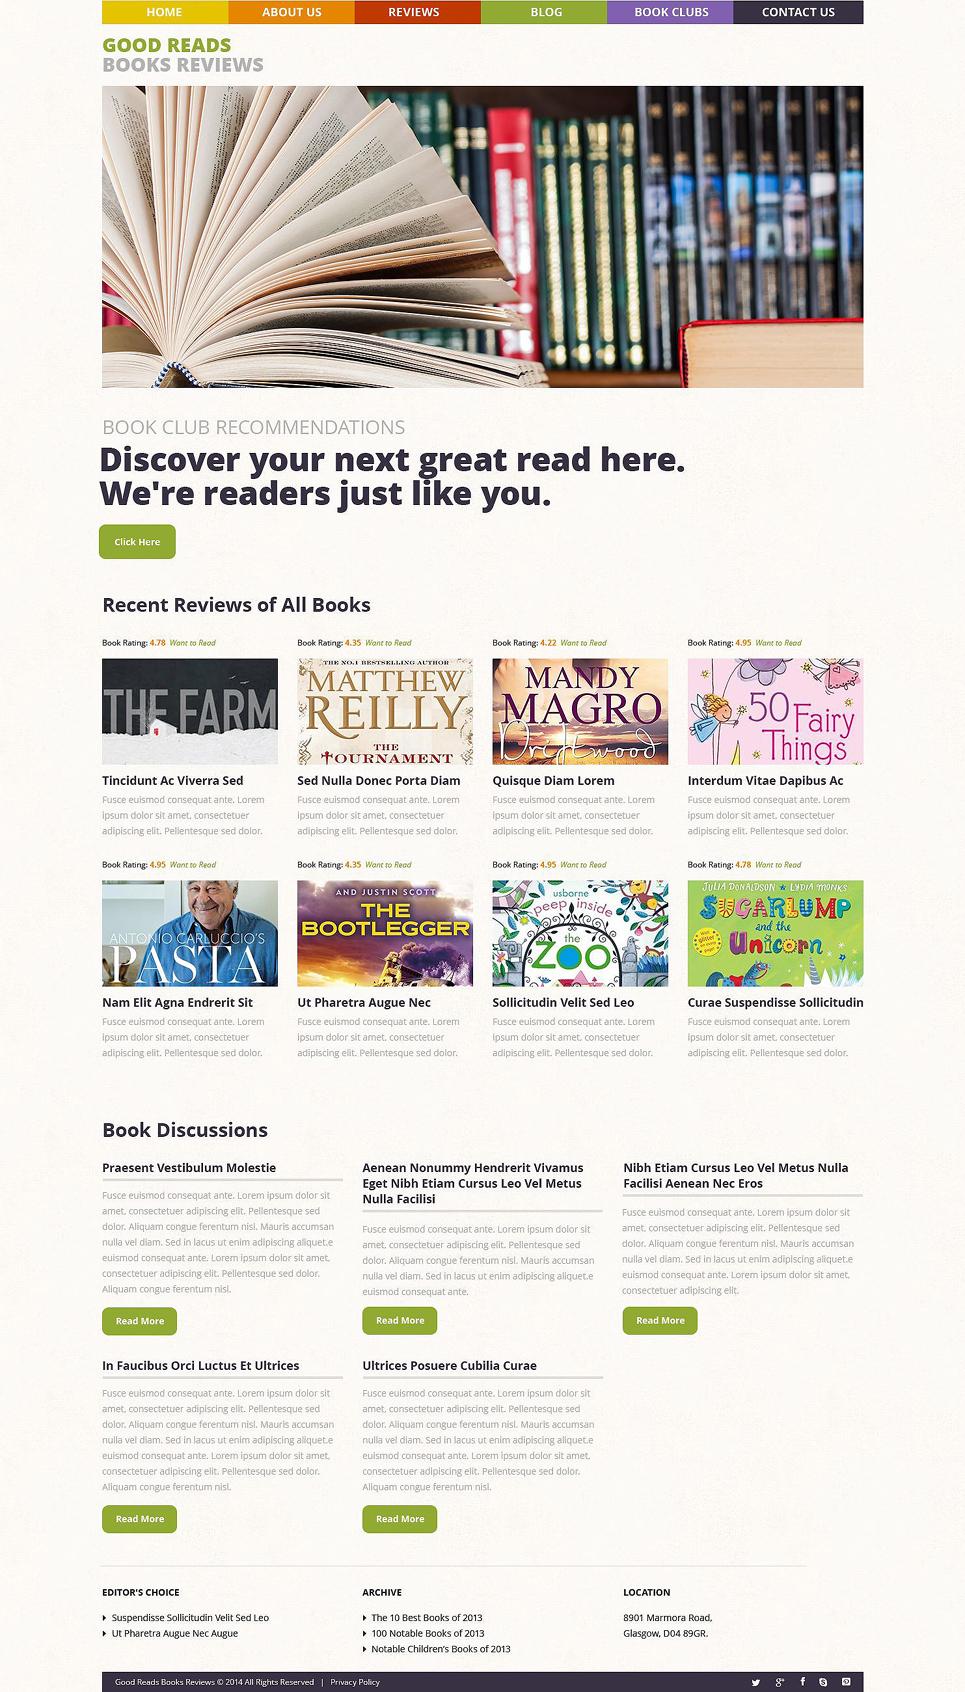 Адаптивный шаблон сайта на тему обзор книг #53486